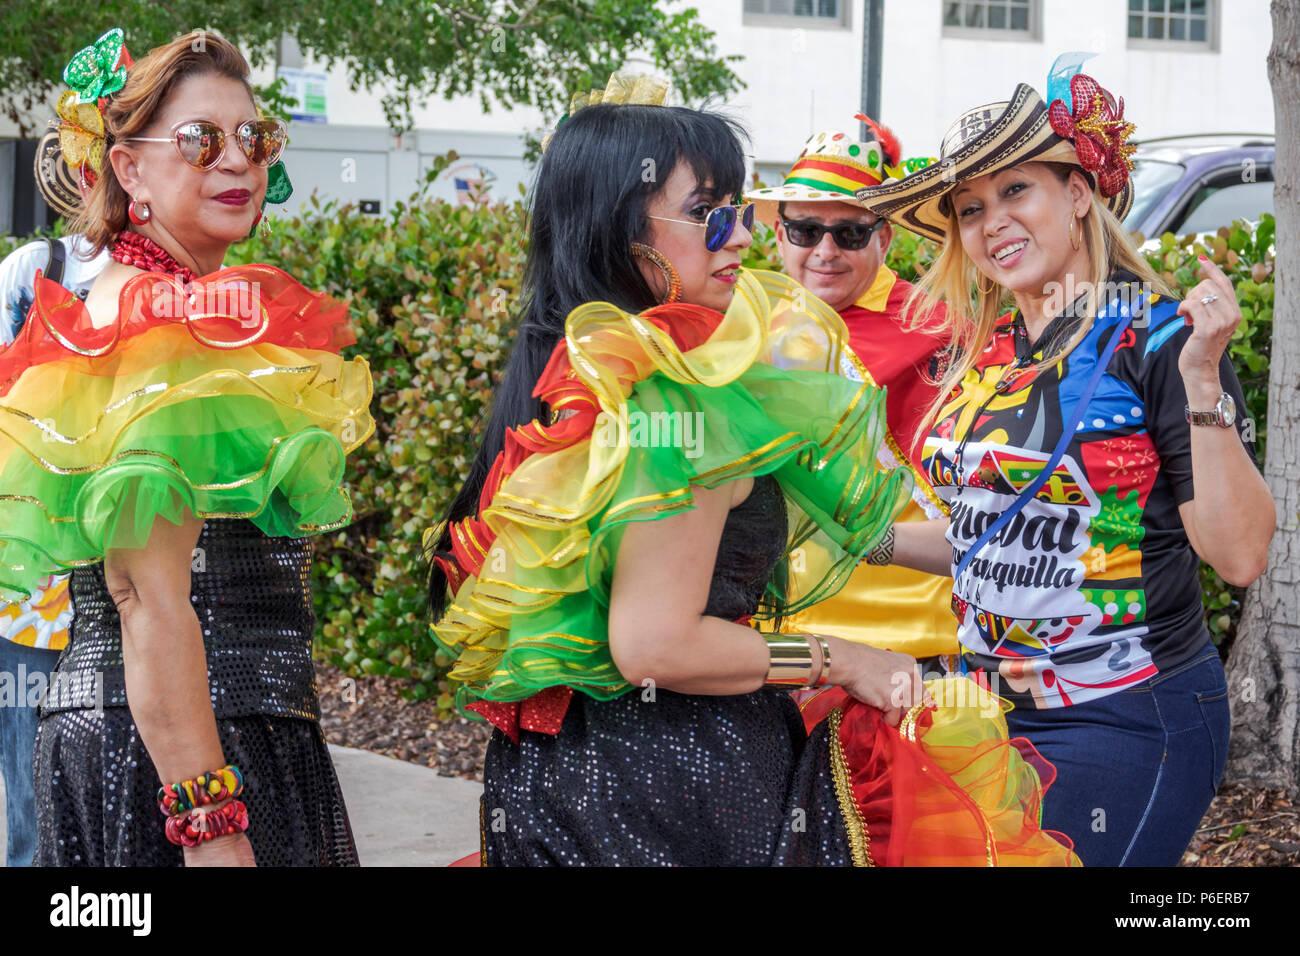 c1f46e48d Miami Florida Coral Gables Hispanic Cultural Festival Latin American event  dancer performer Colombian typical costume Baile